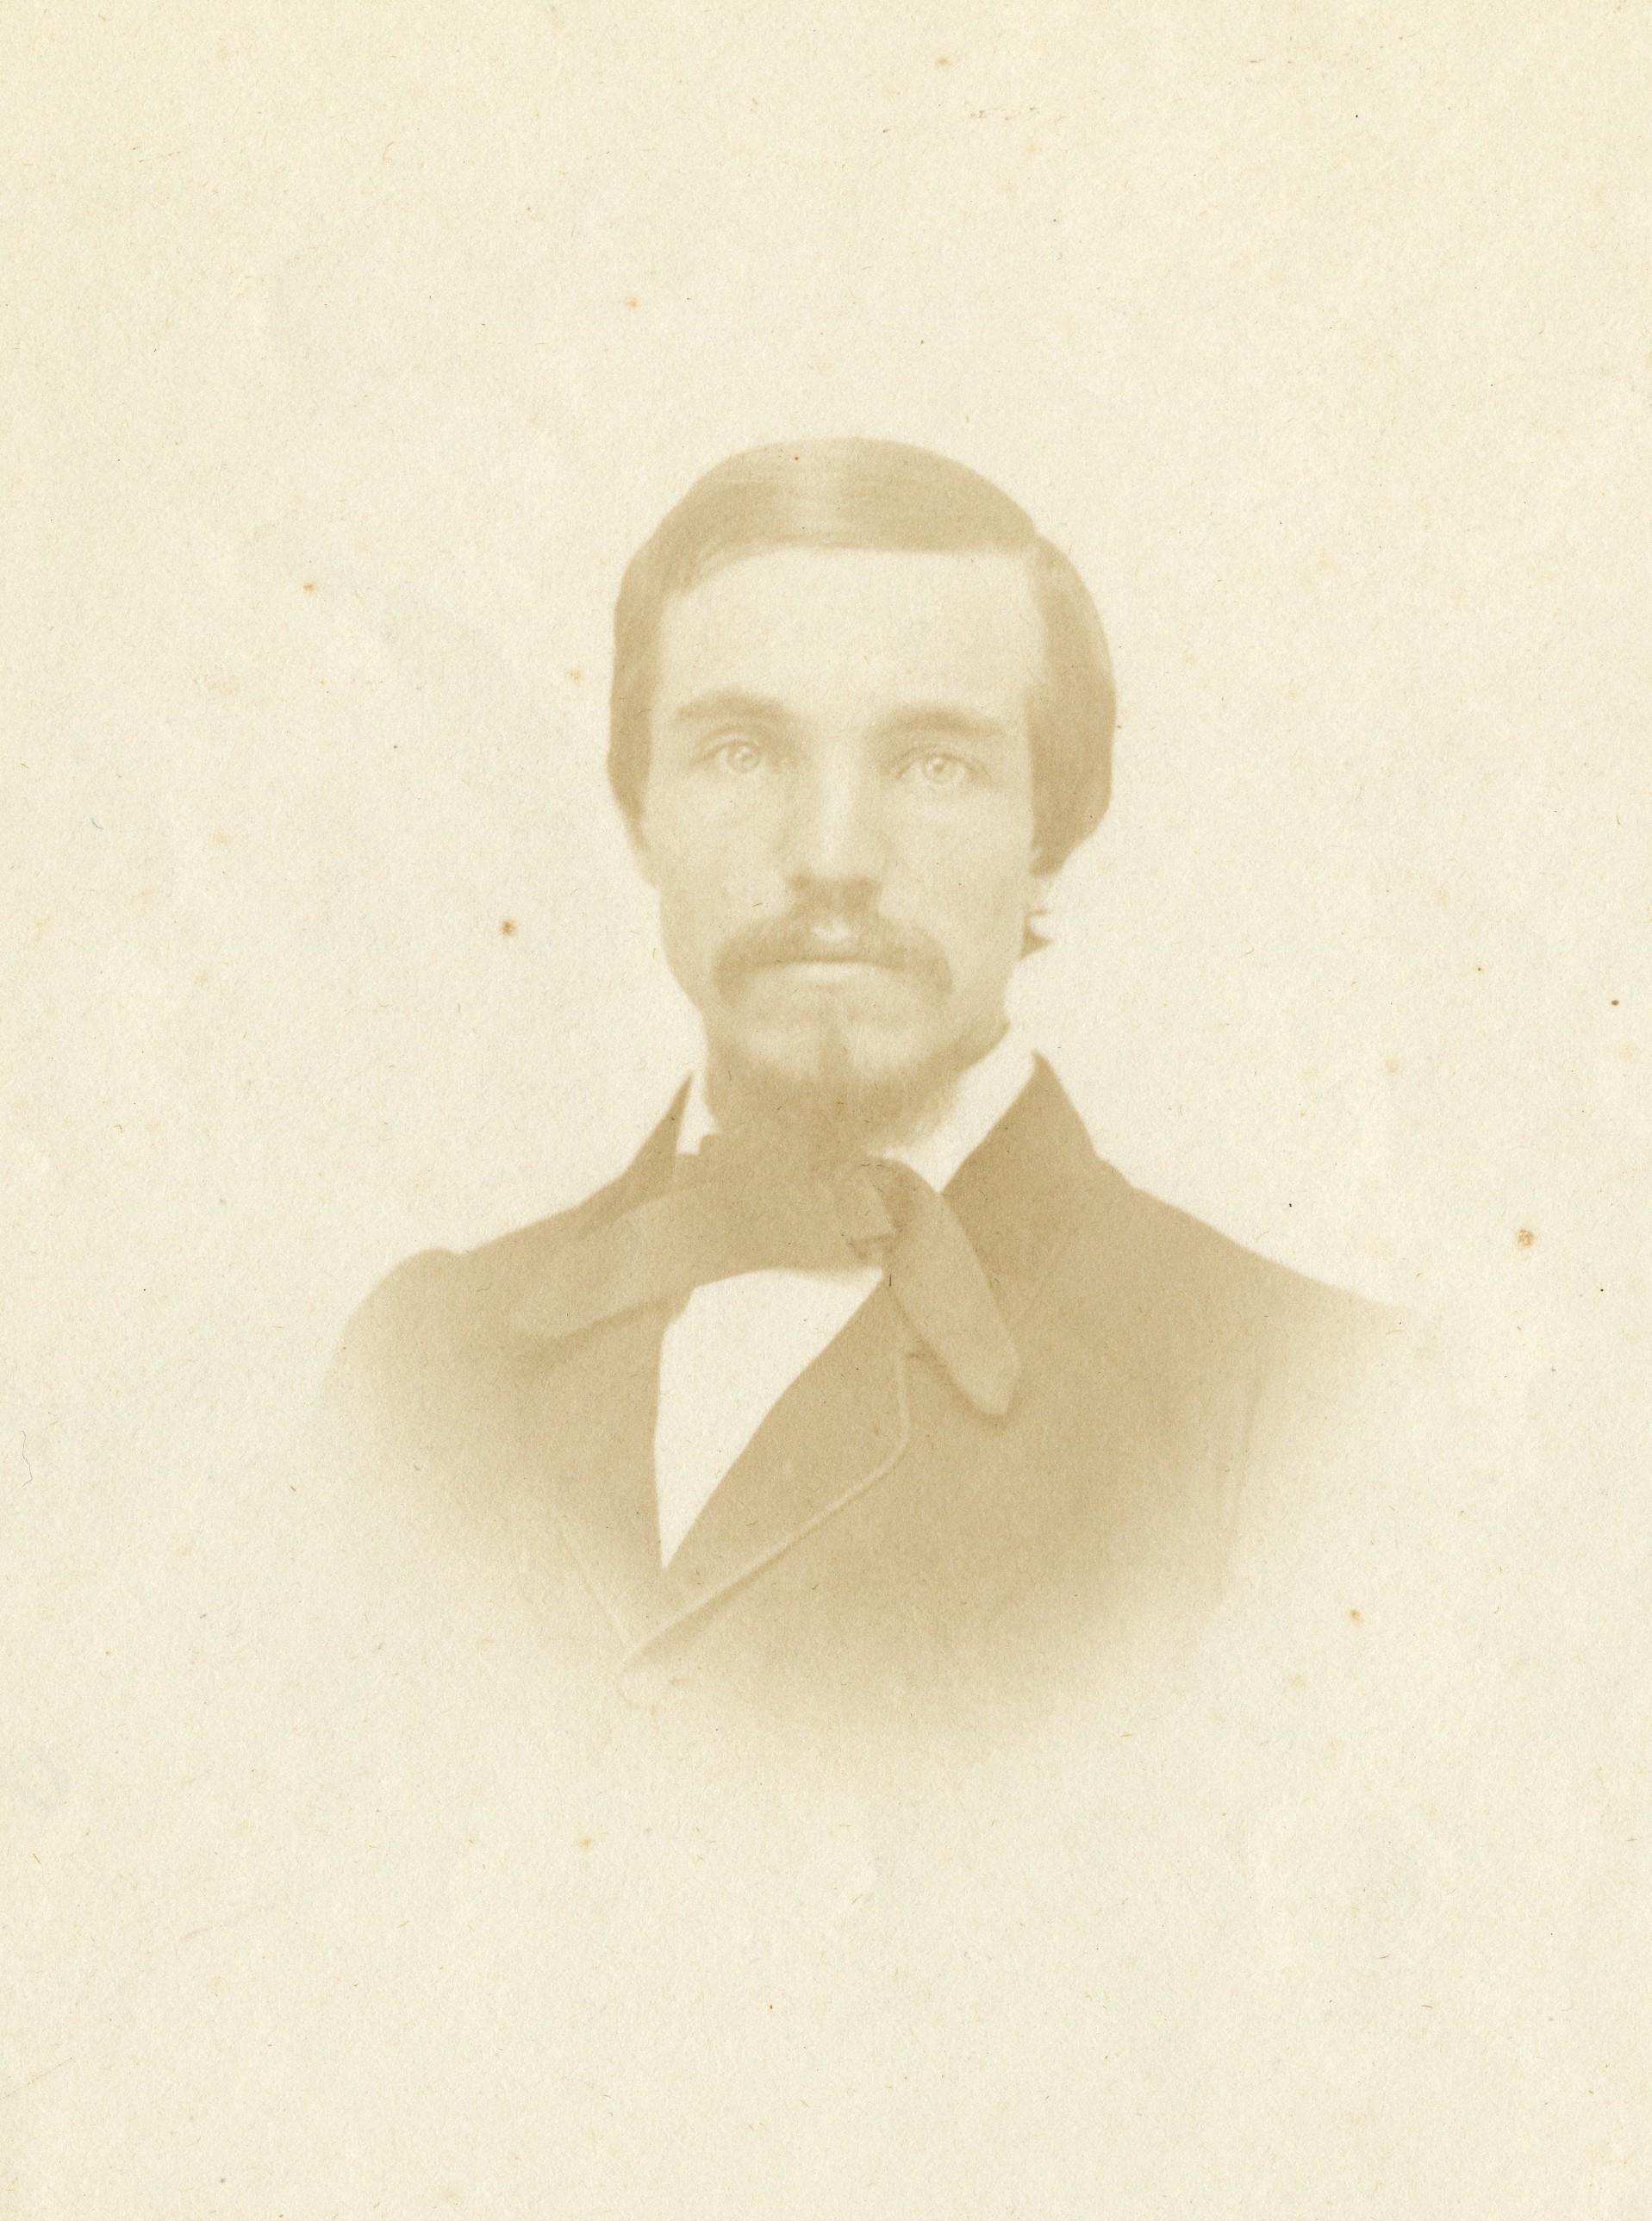 Brainerd Kellogg (Class of 1858) portrait [1]